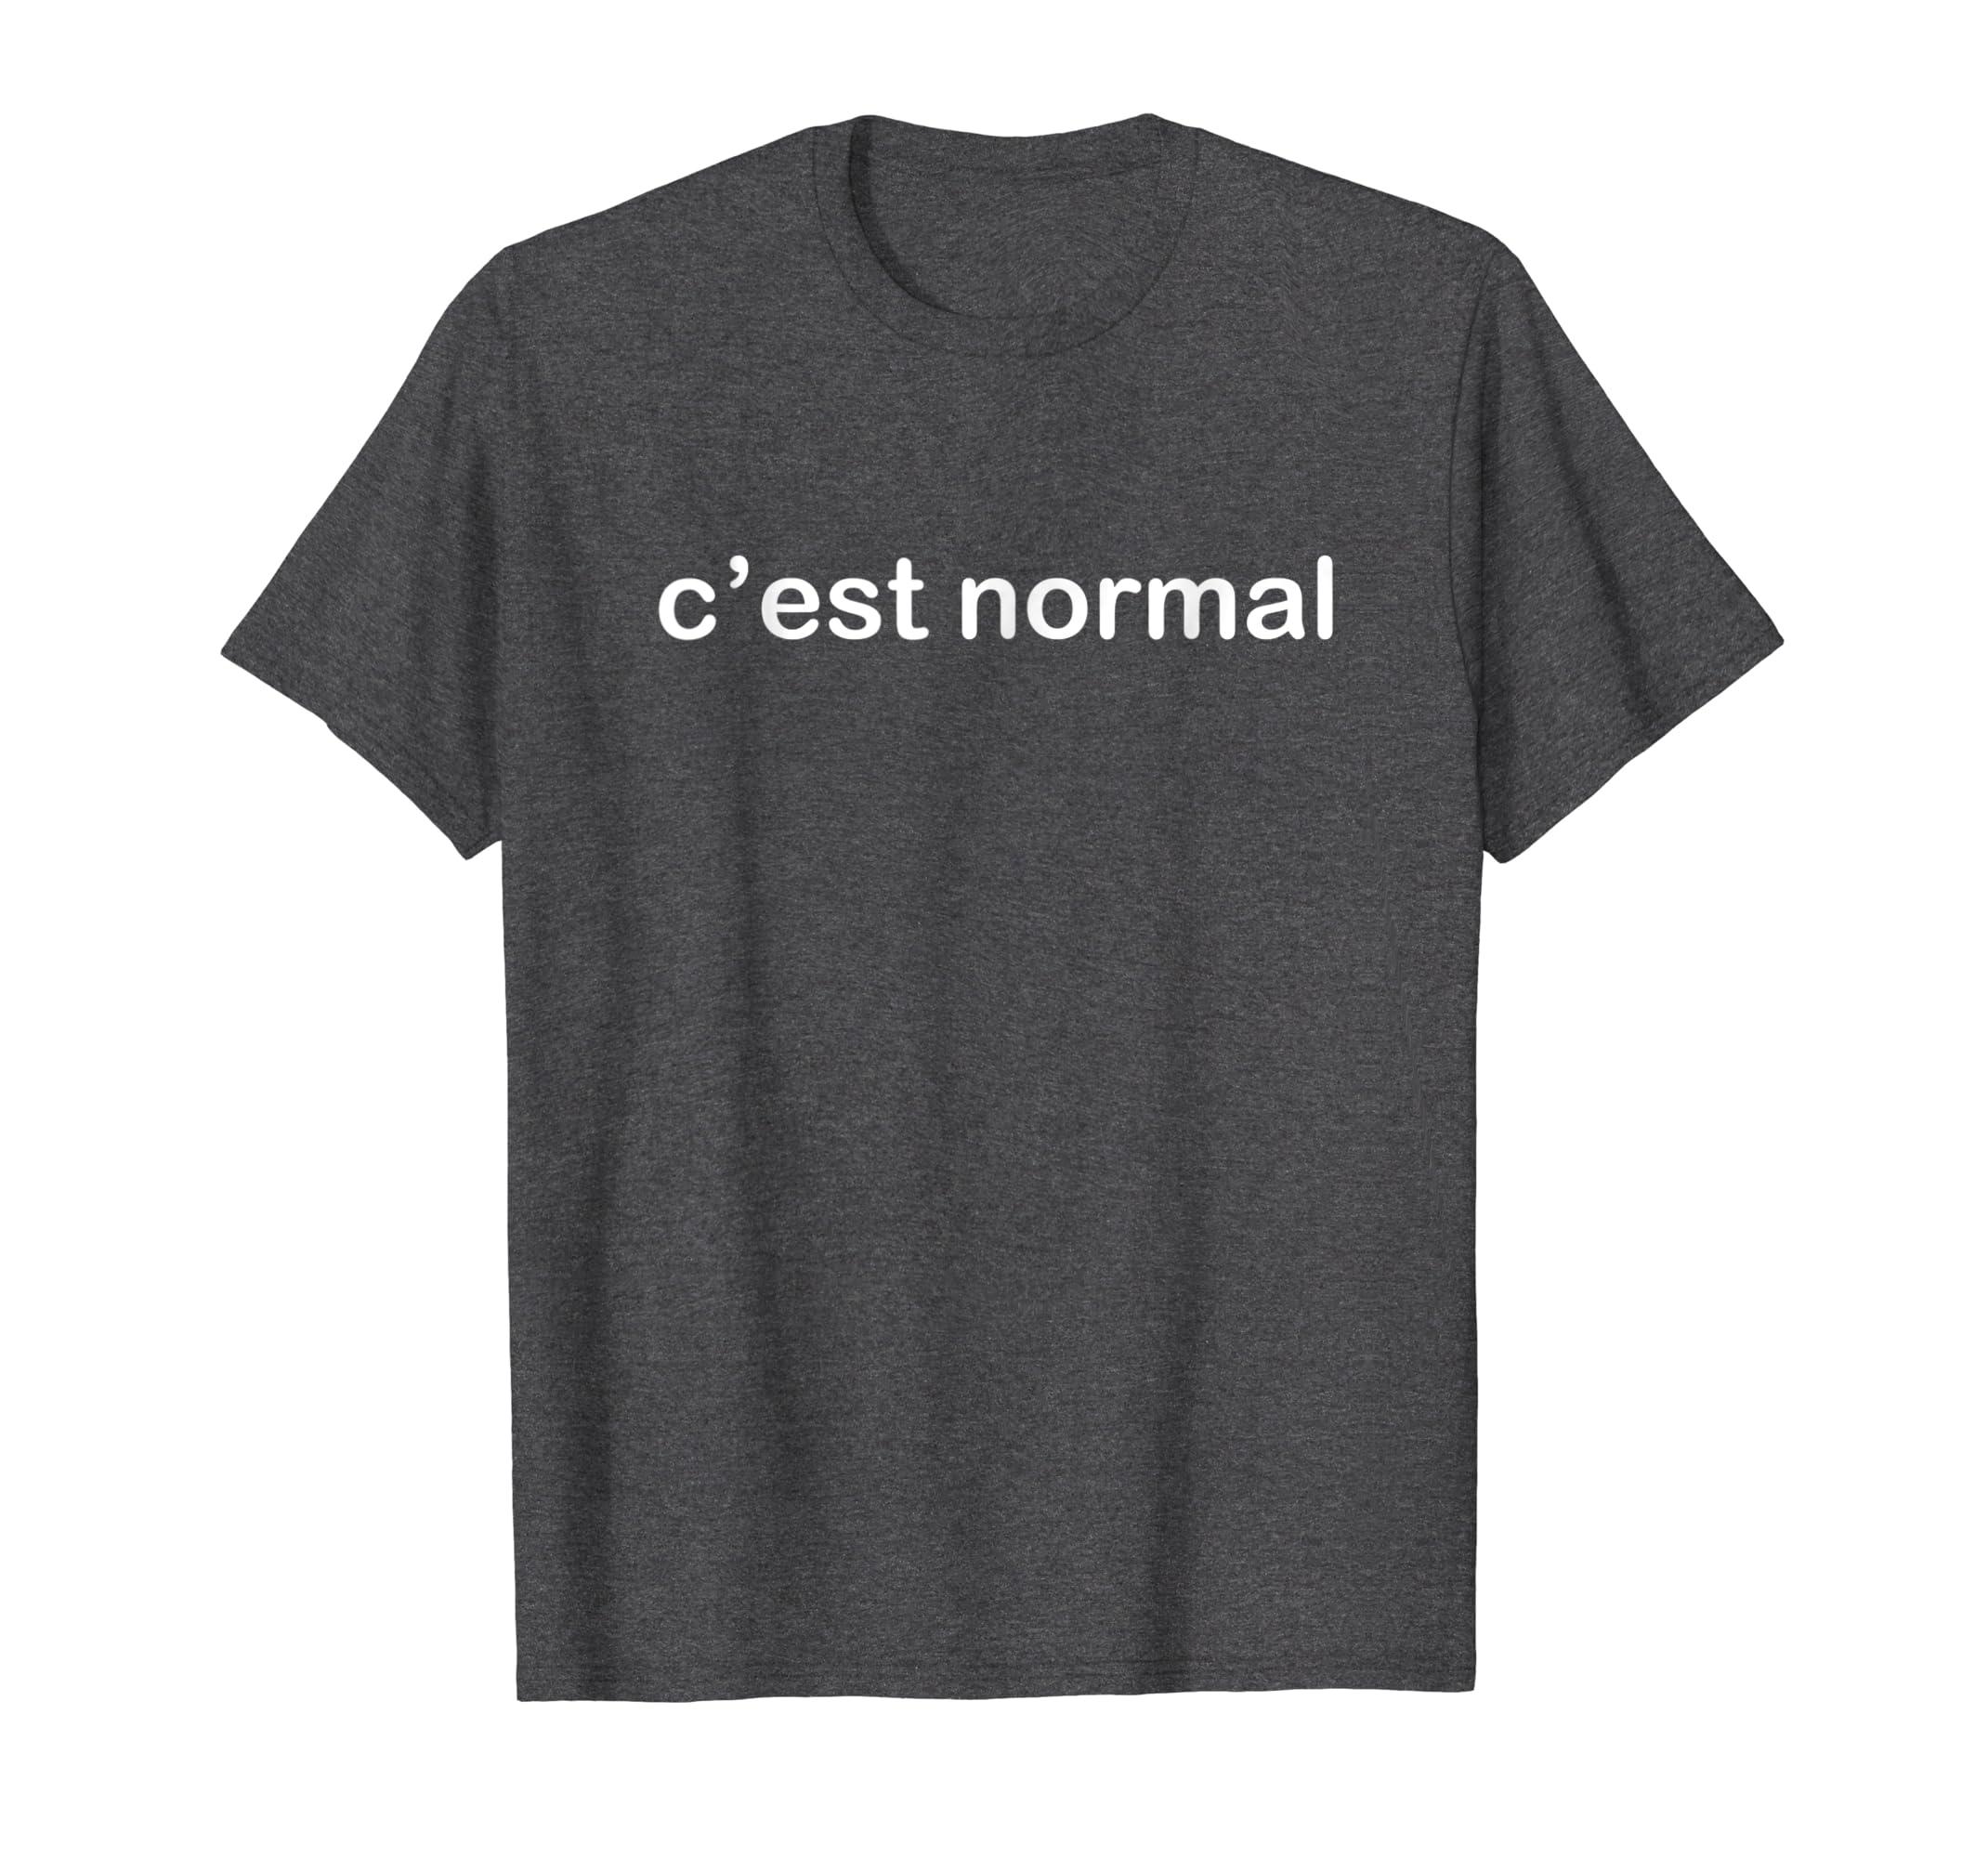 Amazon.com: c'est normal (it's not a big deal, no worries) T-shirt: Clothing